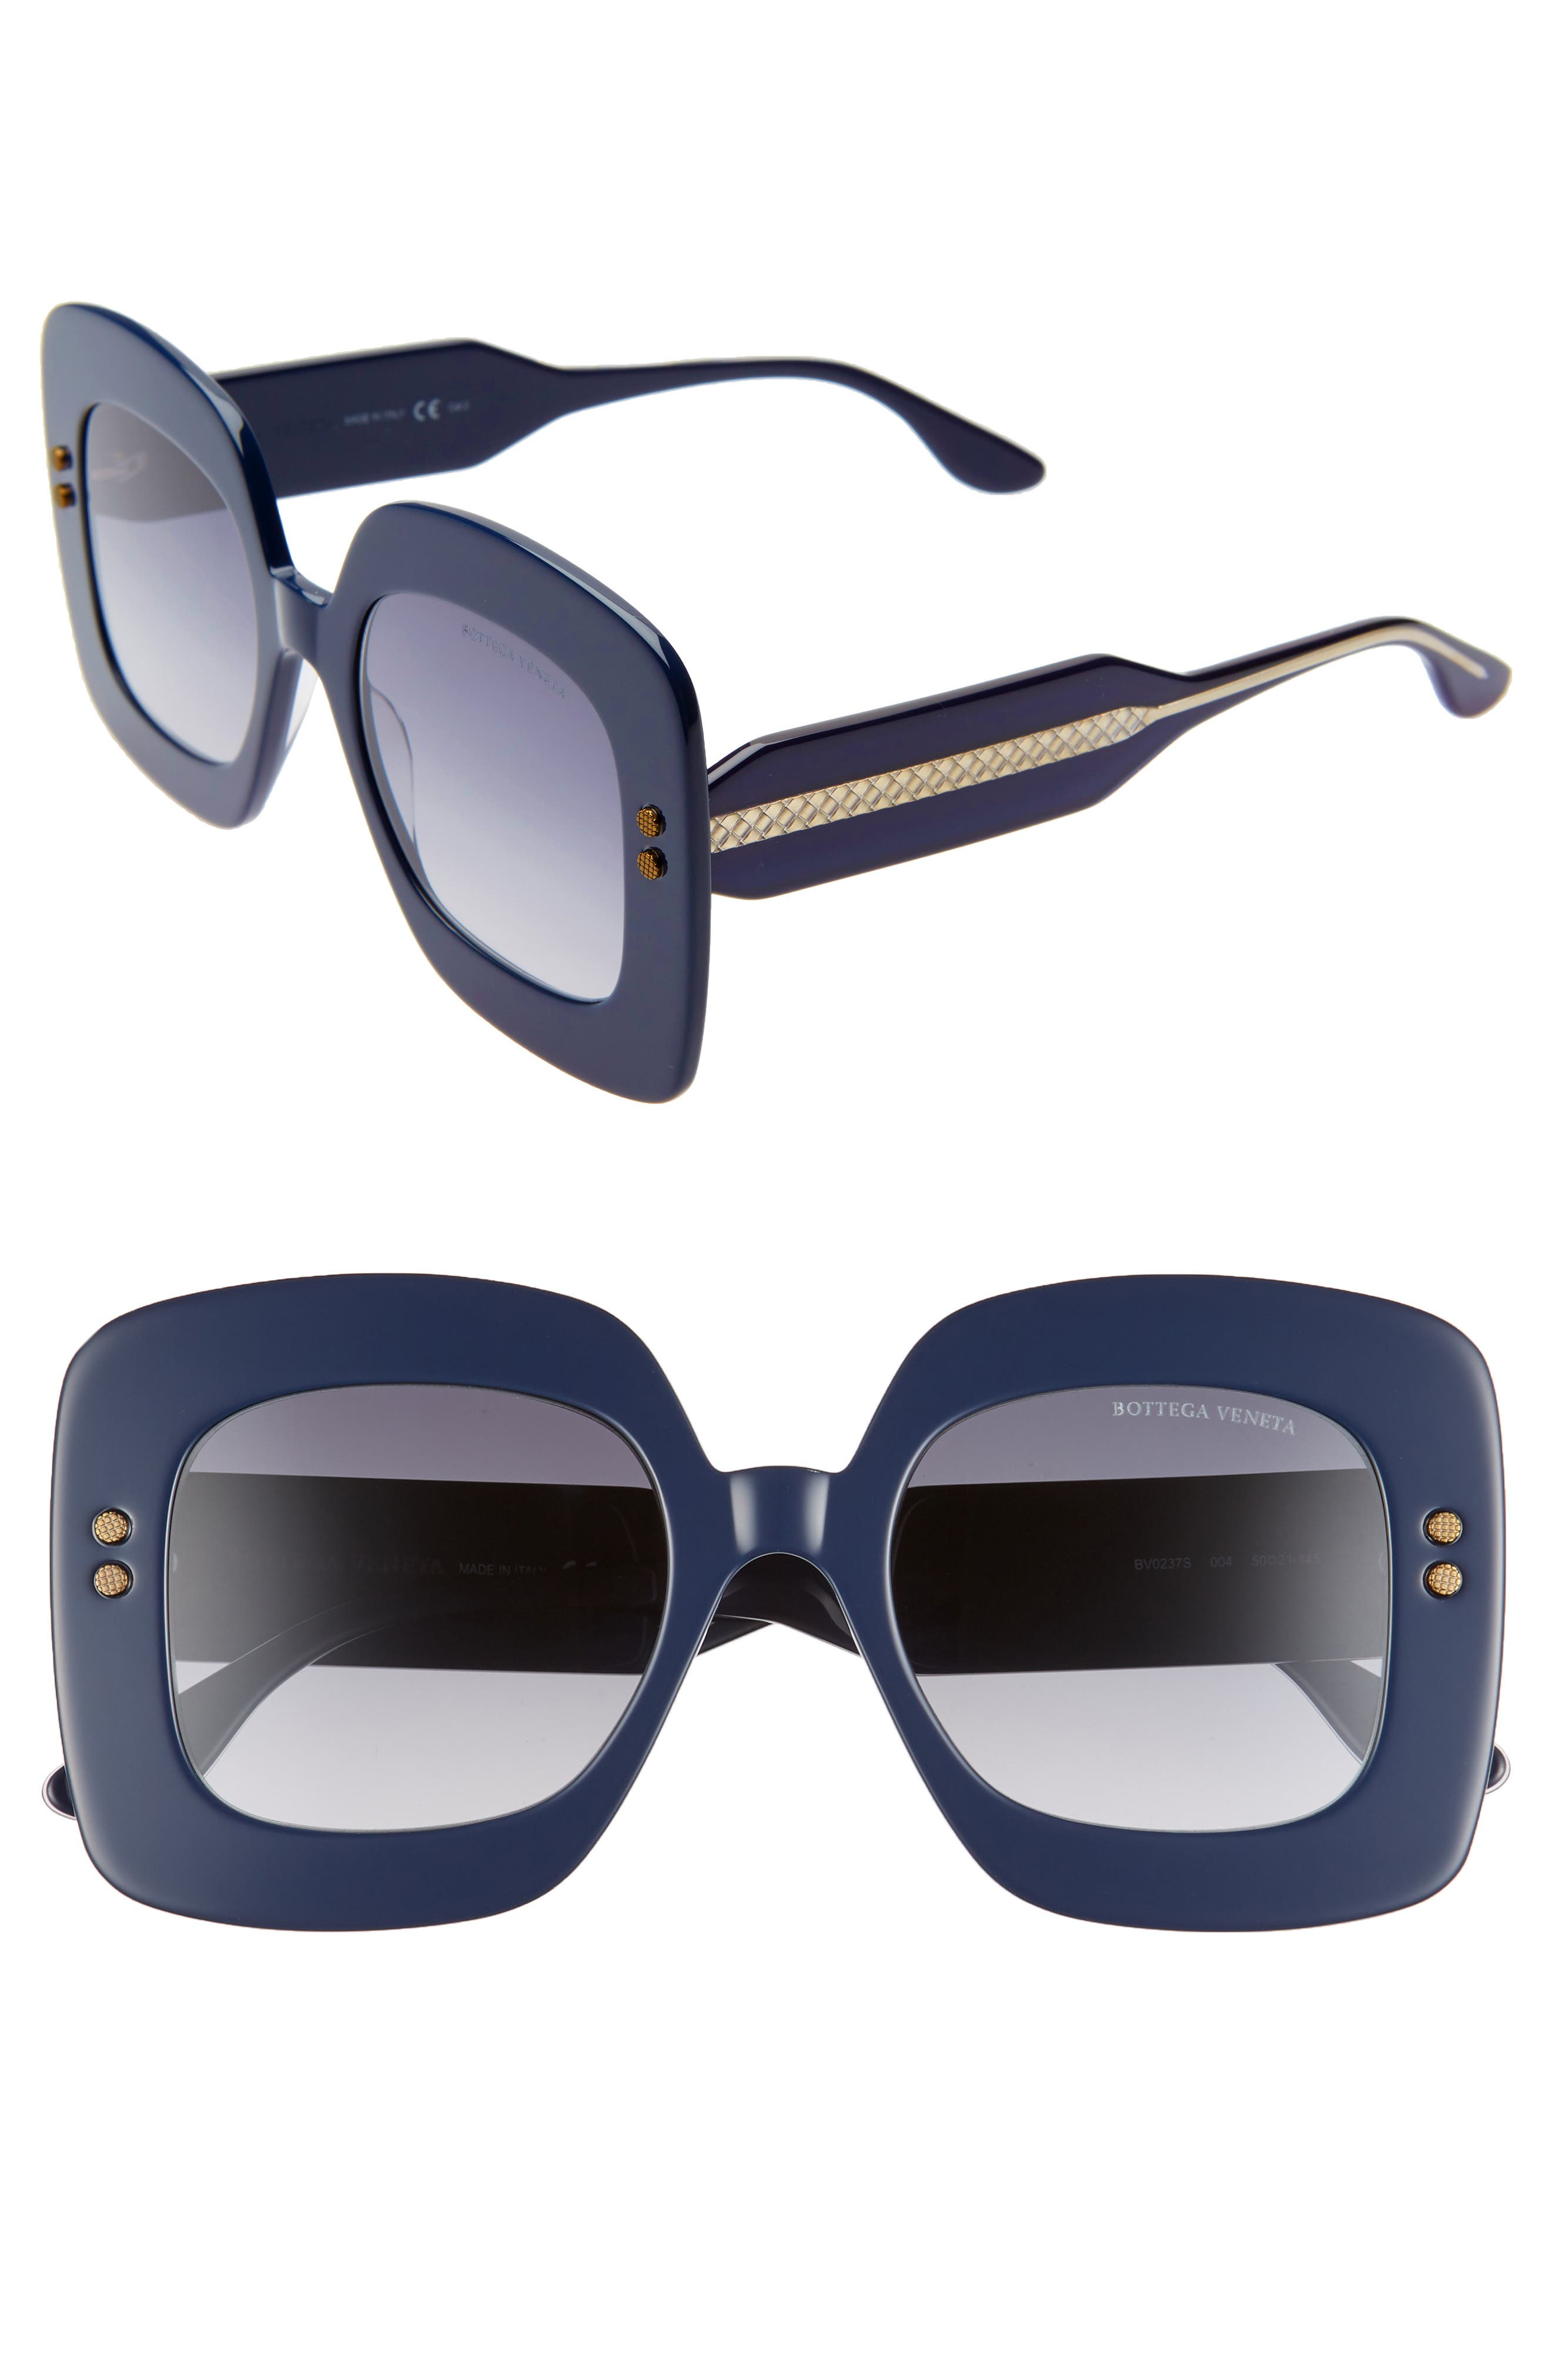 Bottega Veneta 50Mm Gradient Square Sunglasses - Dark Blue/ Blue